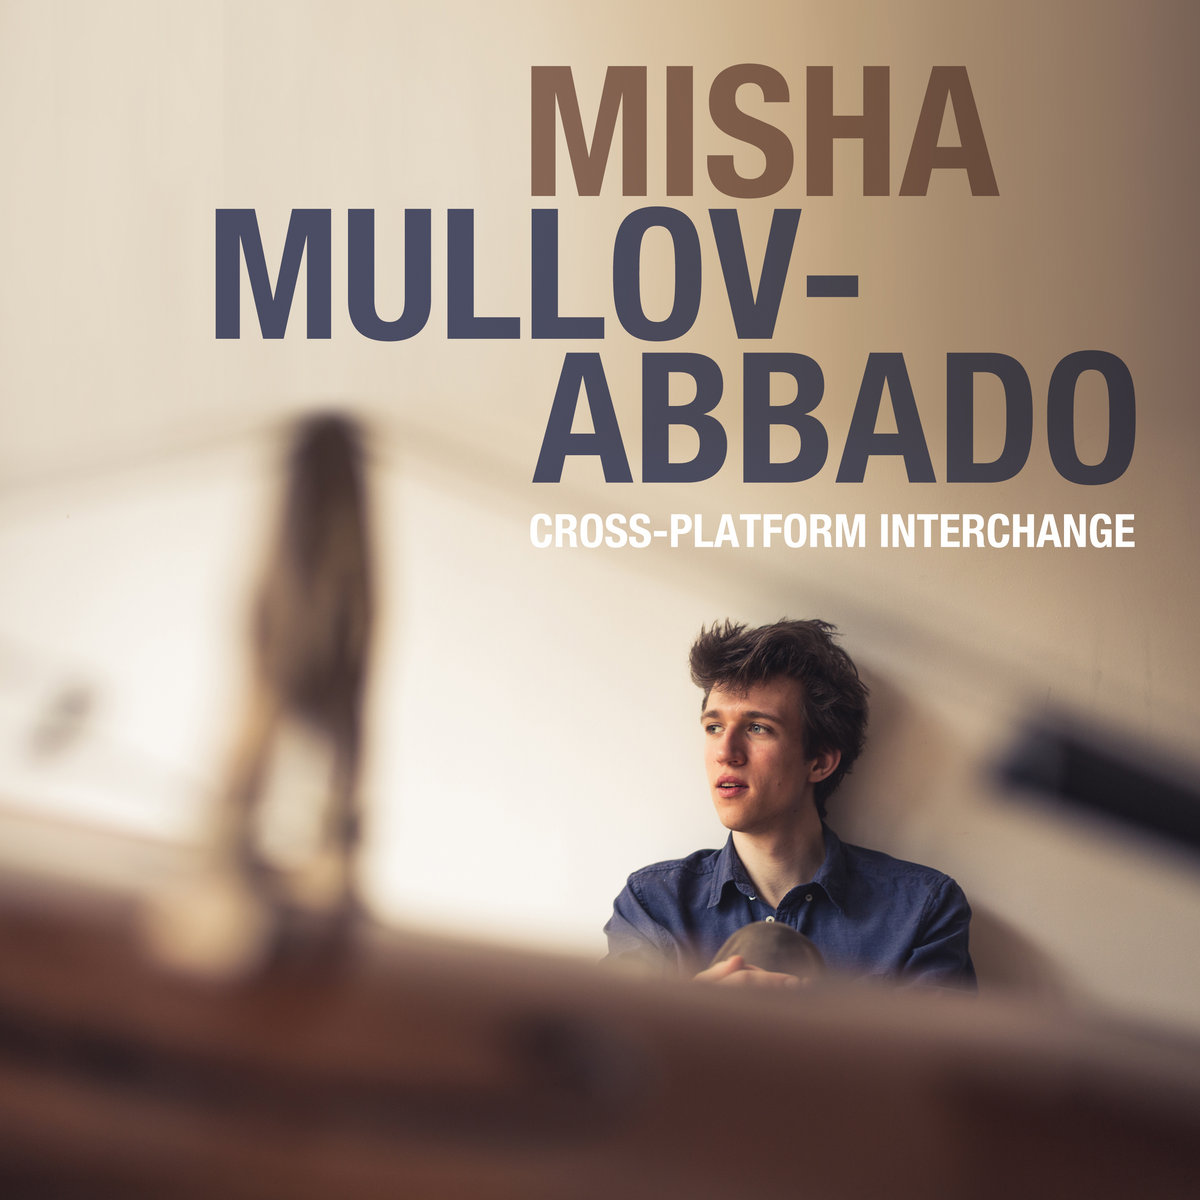 Image result for cross-platform interchange misha mullov